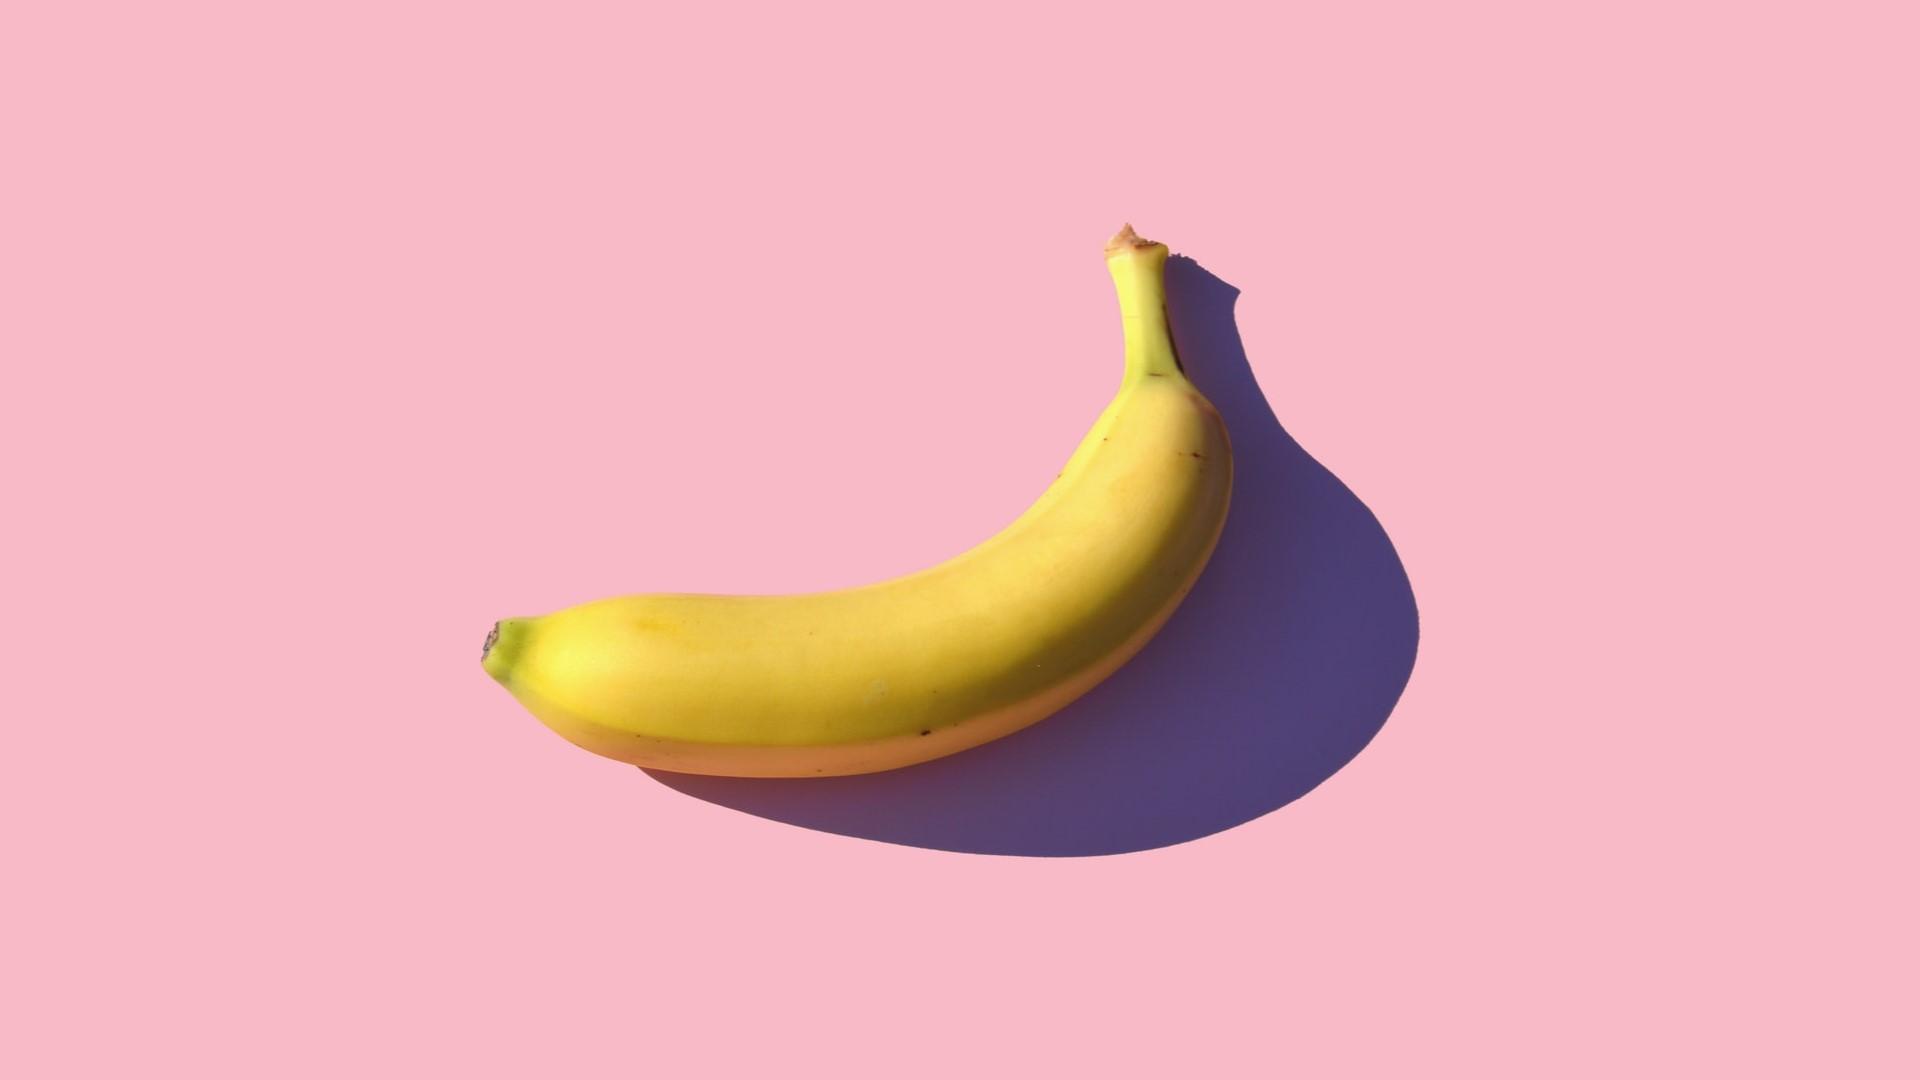 Bedroht ein Pilz unsere Banane? Bild: Mike Dorner/ unsplash.com